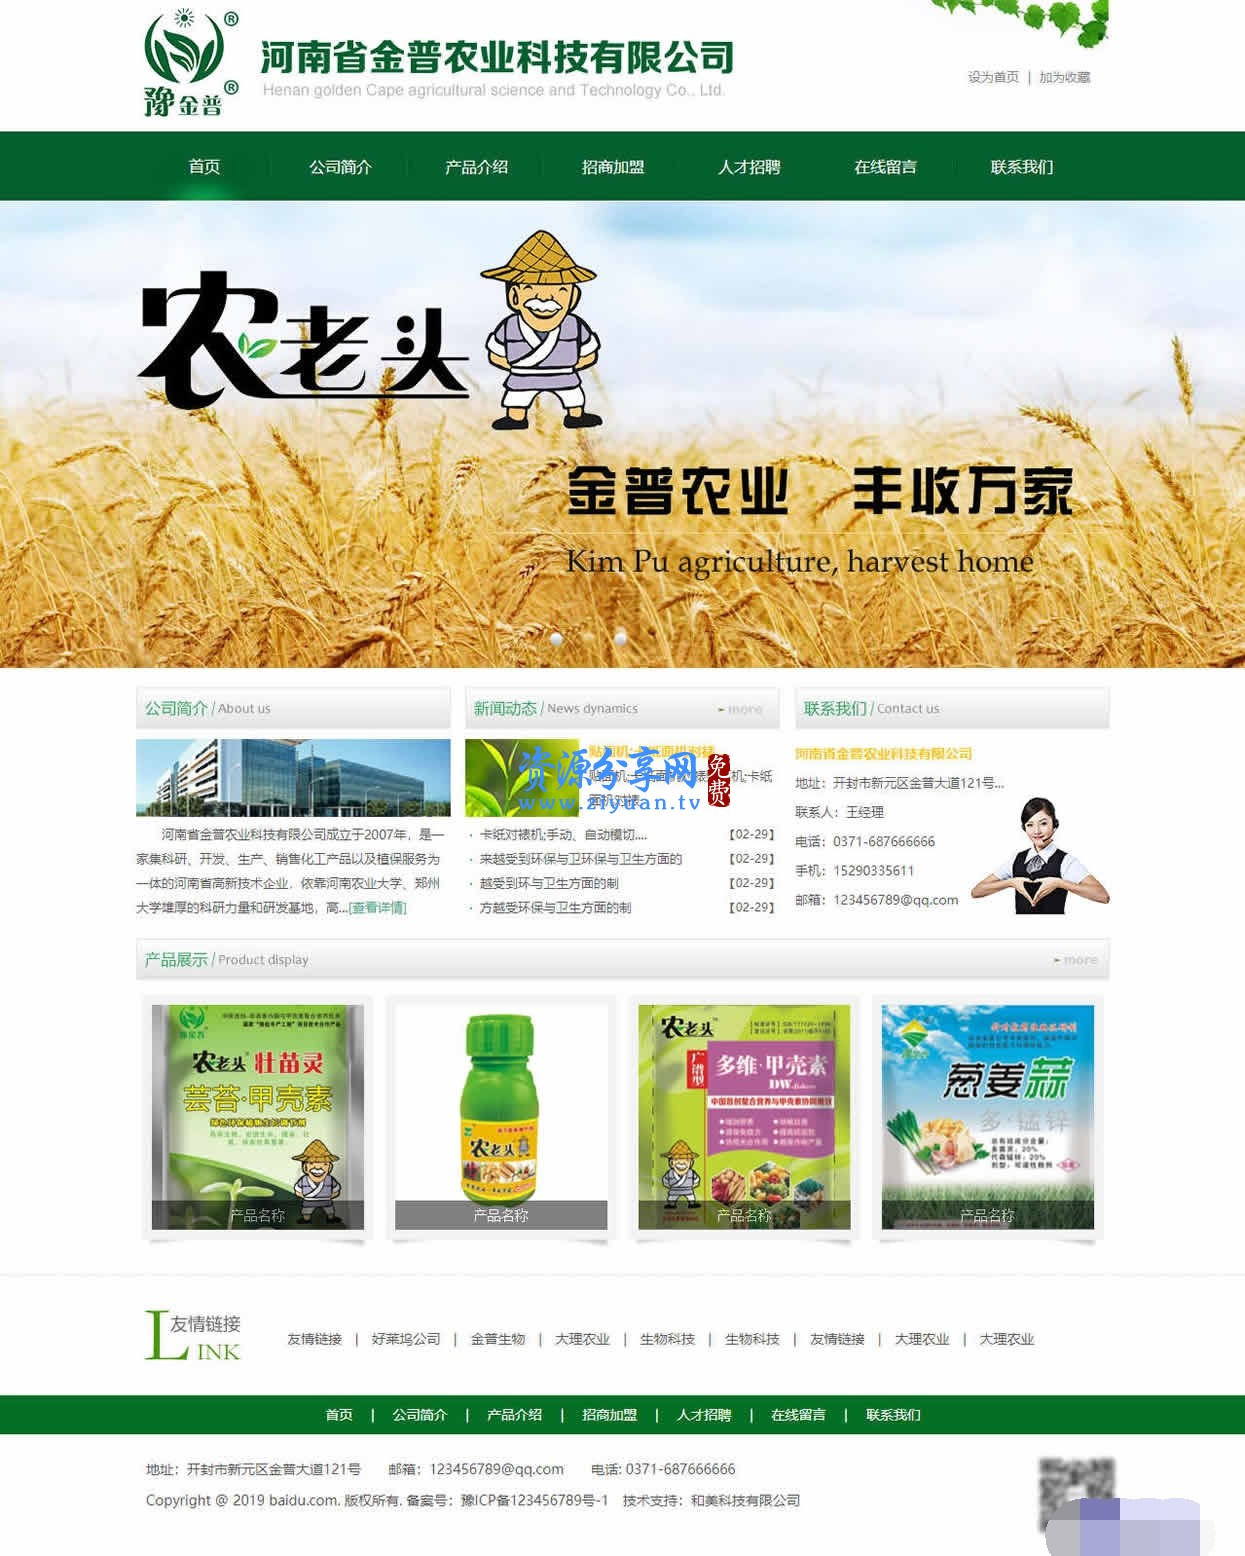 HTML 绿色风格农业科技公司网站模板